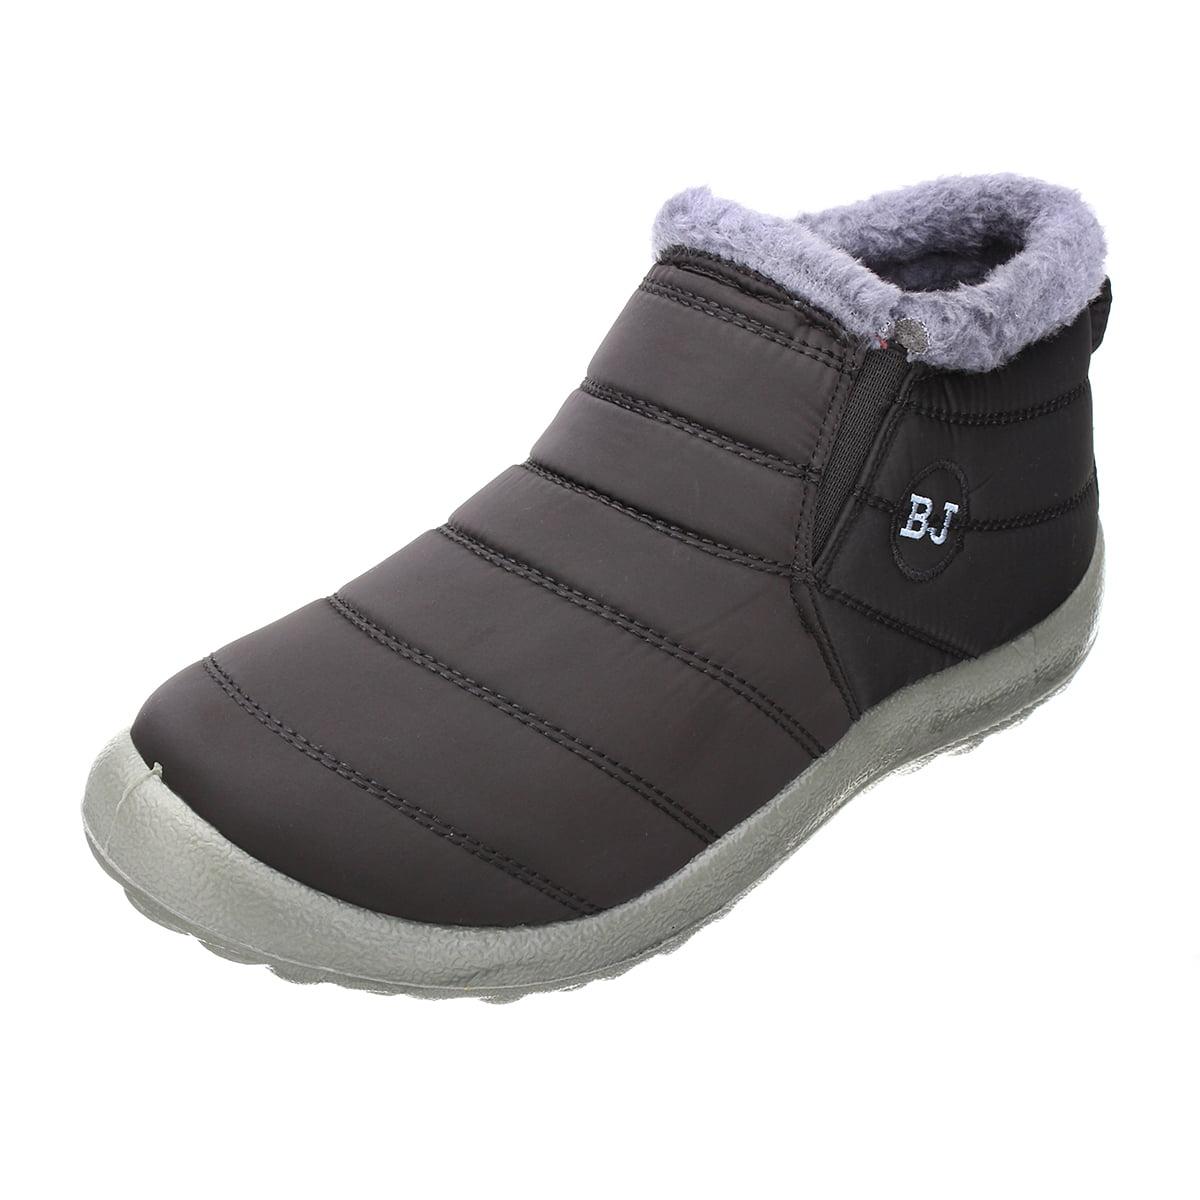 Women Boots Warm Fabric Fur-lined Slip